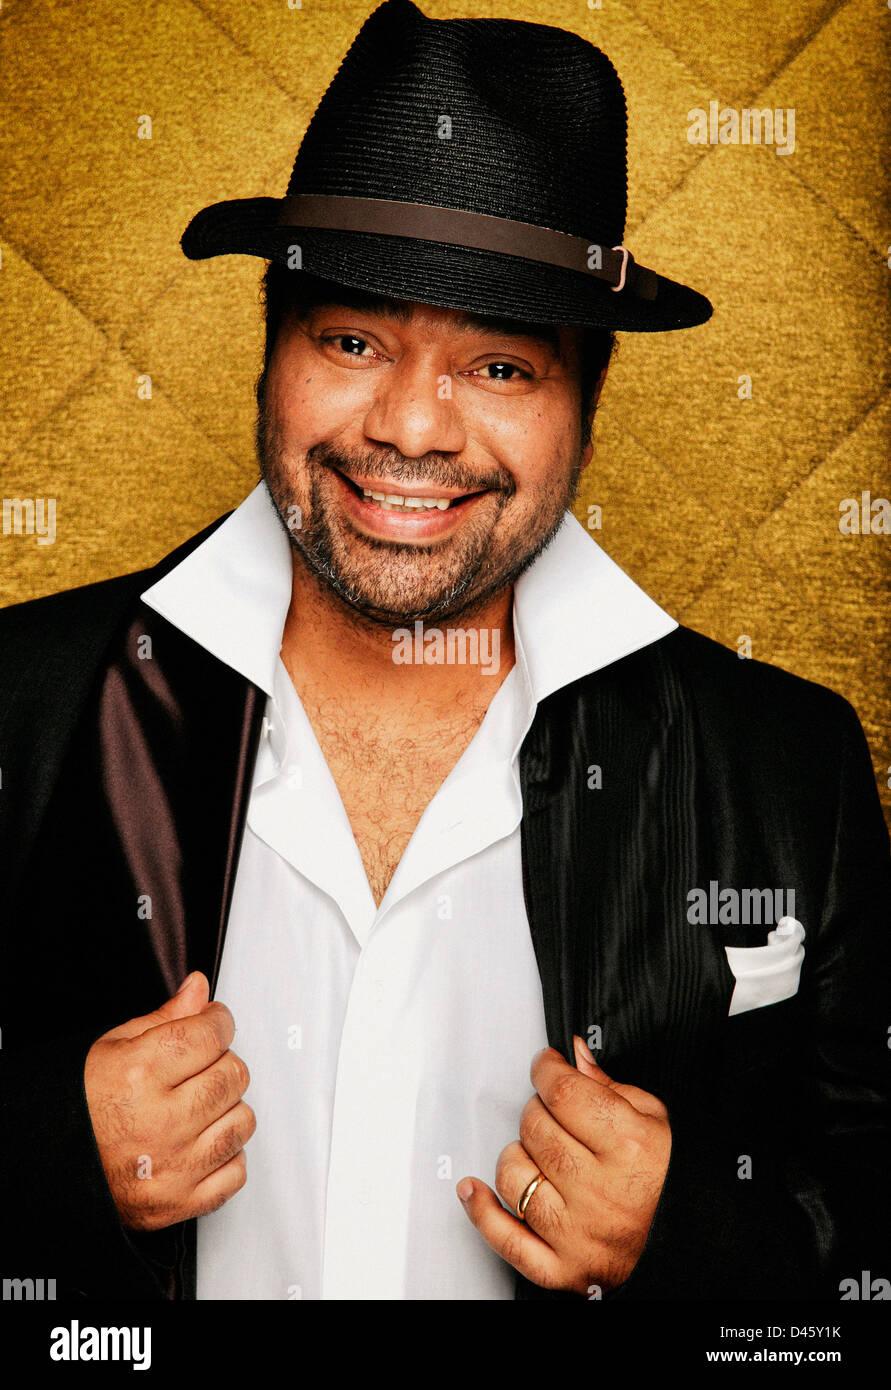 paulo flores angolan celebrity singer - Stock Image